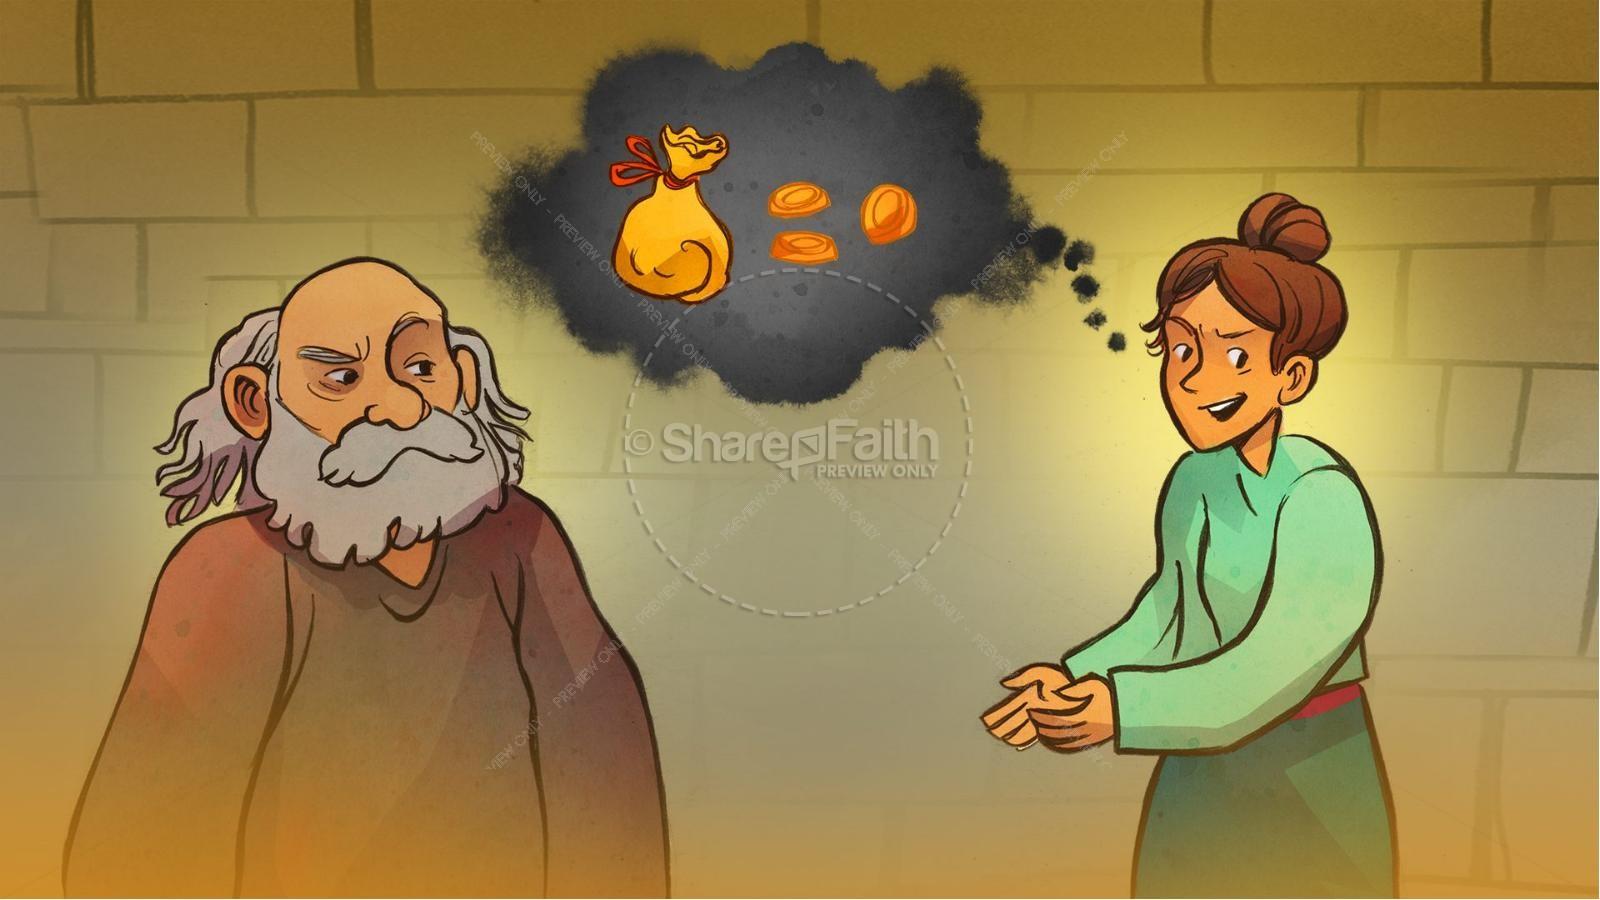 Acts 5 Ananias and Sapphira Kids Bible Stories | slide 7